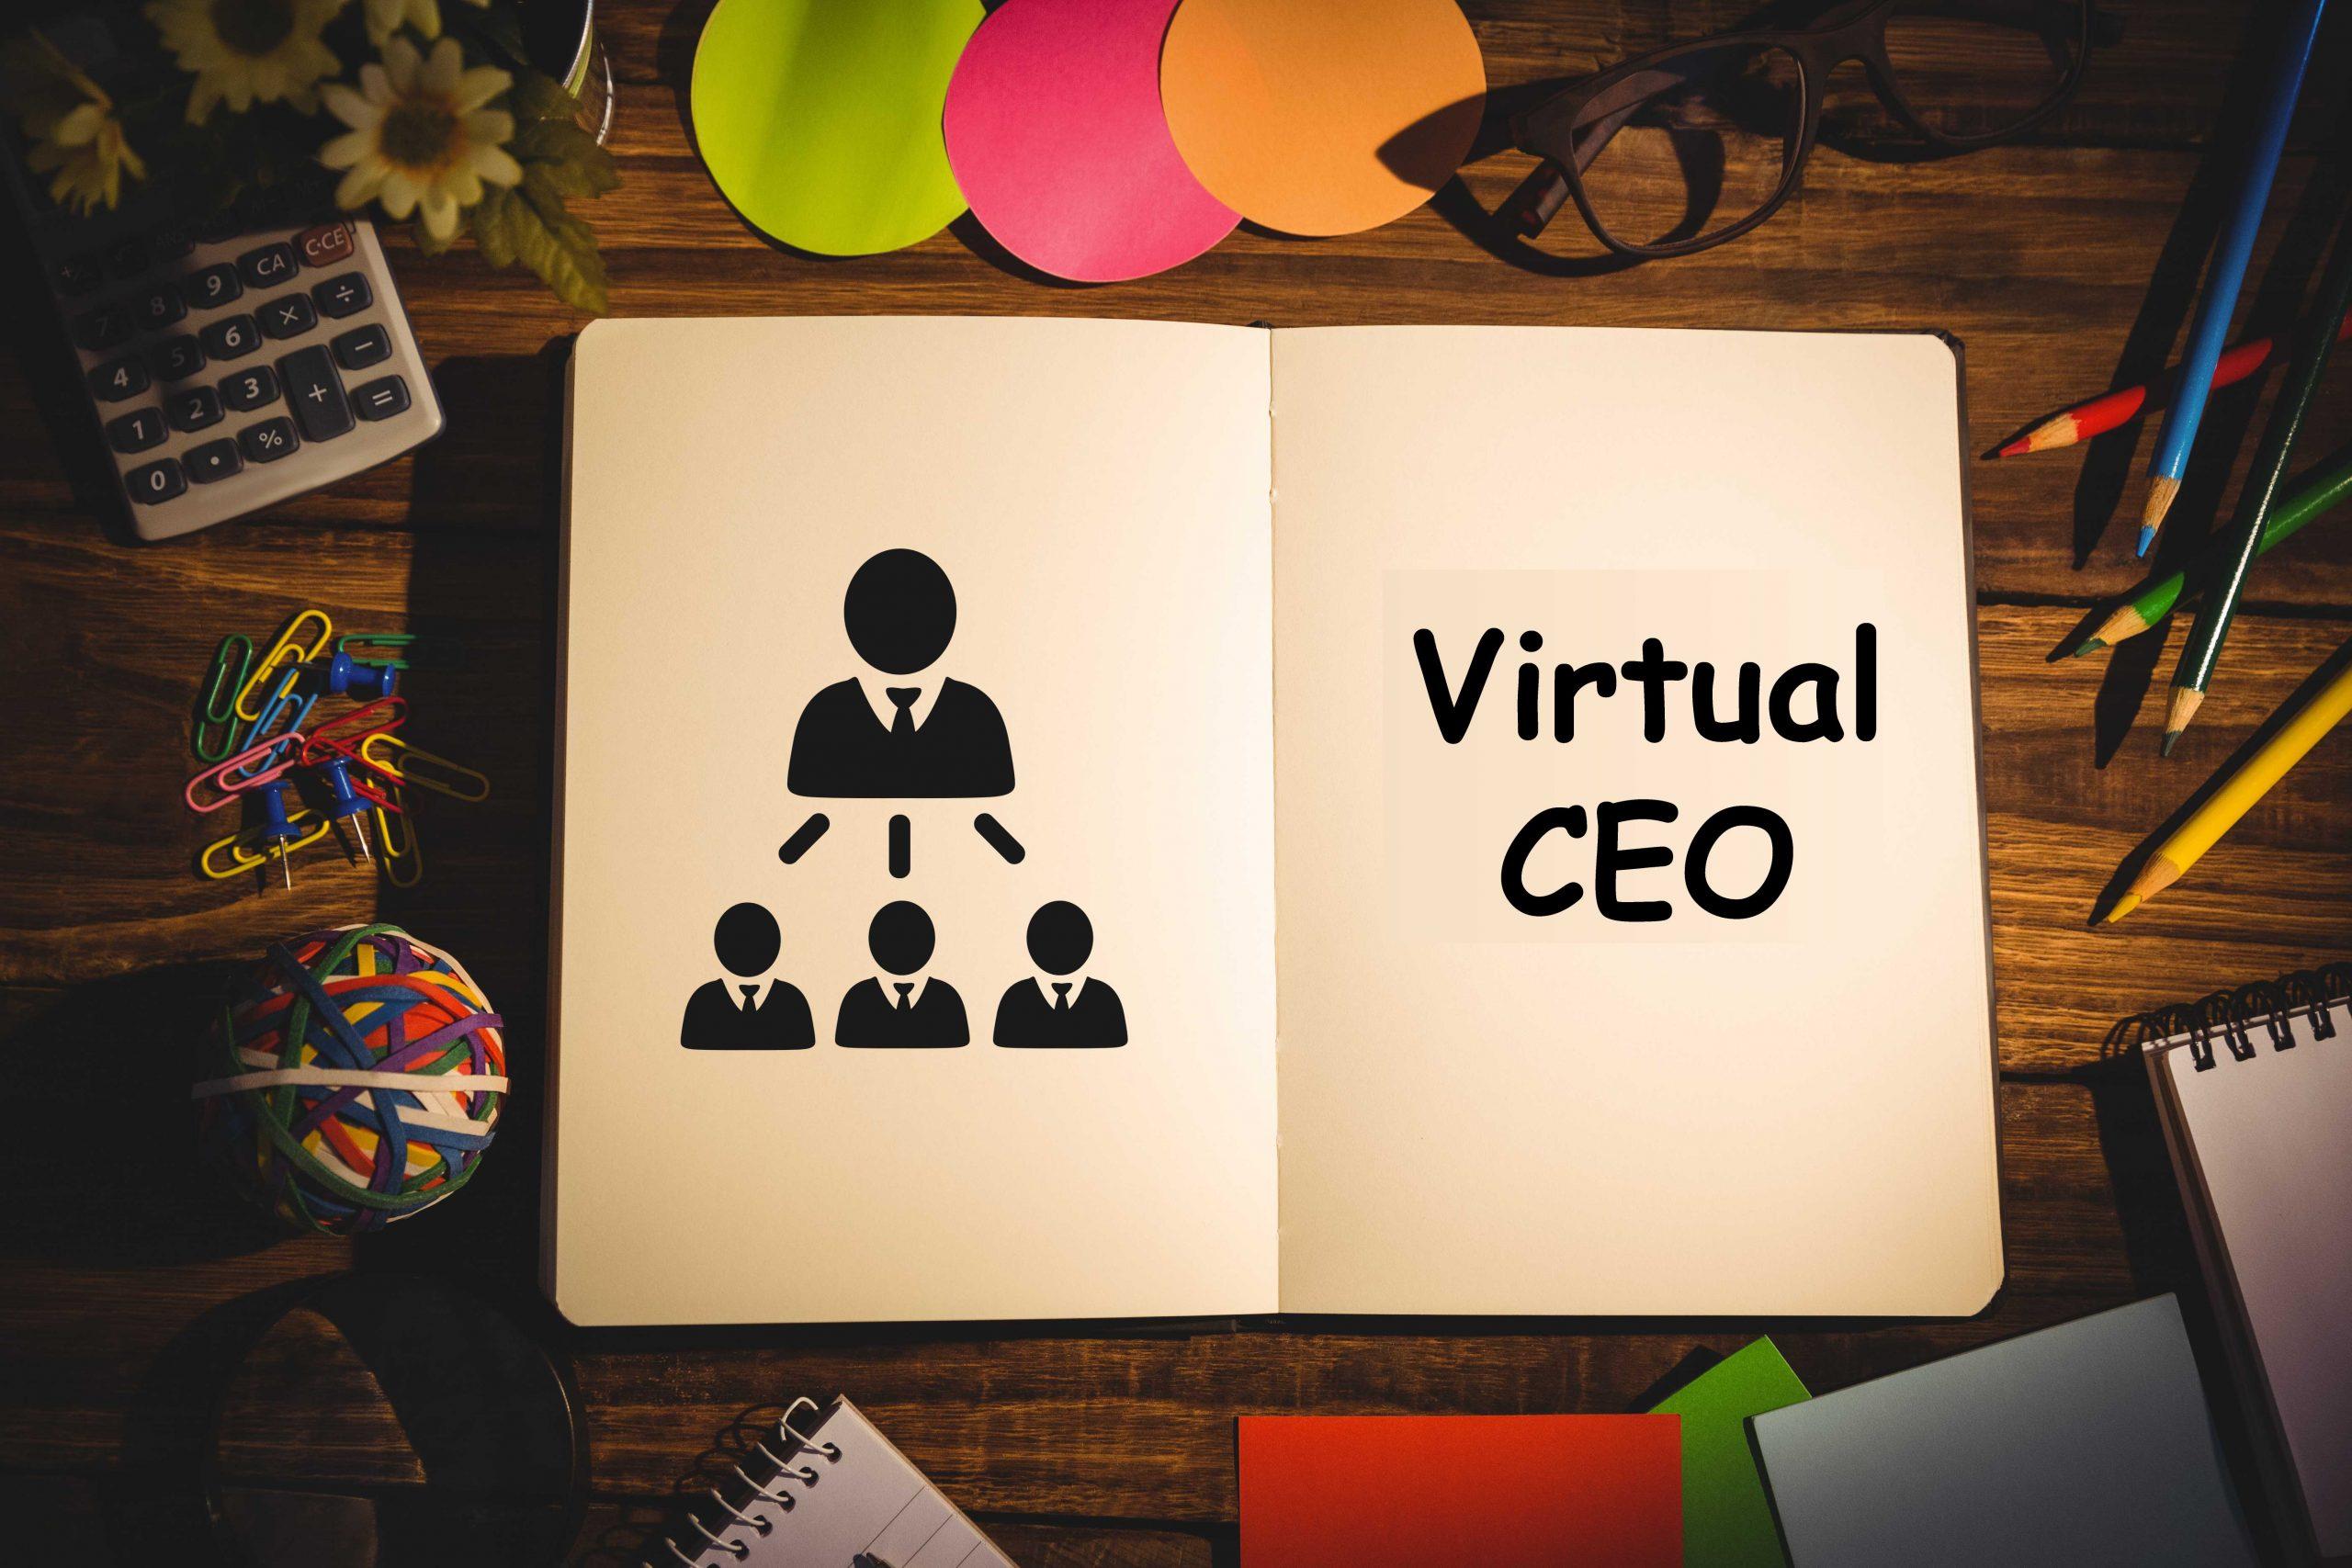 Virtual CEO